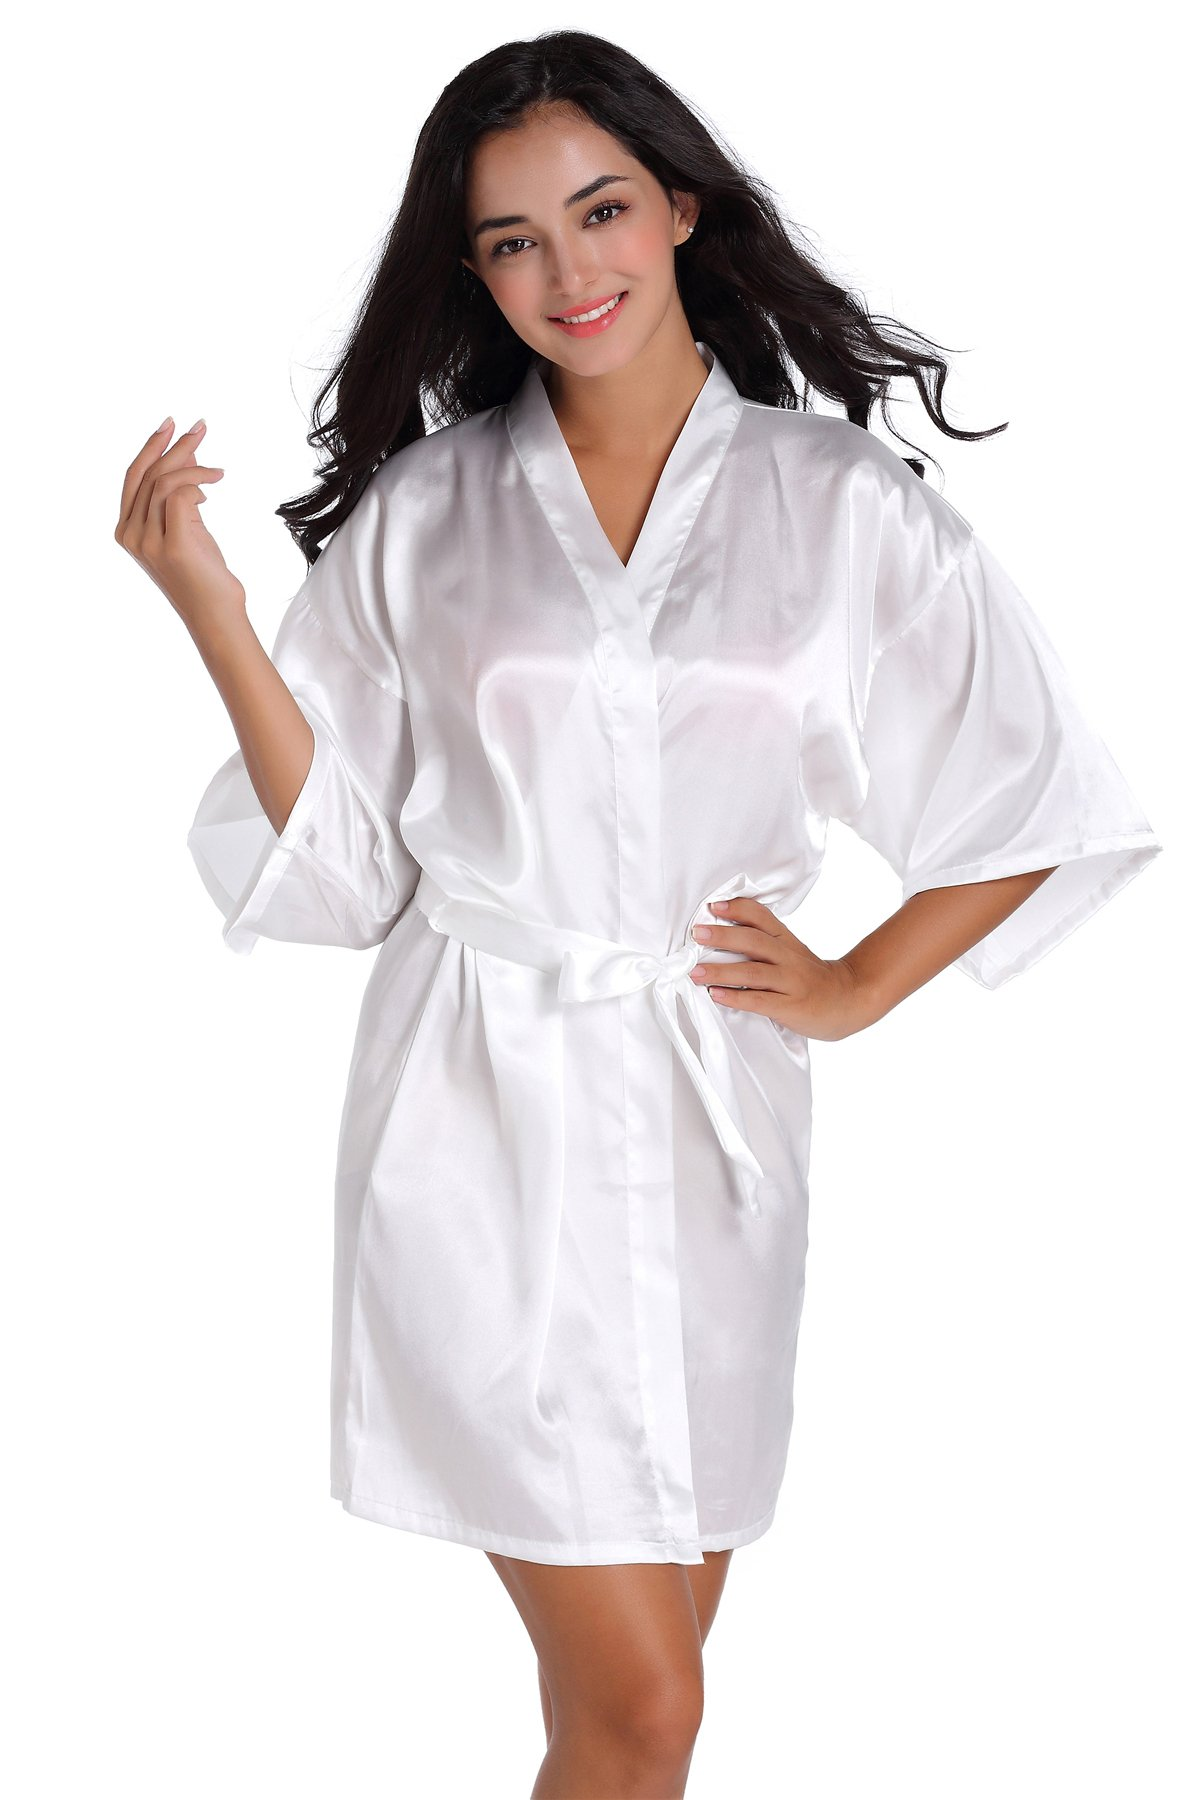 SIMJOY Women s Satin Short Kimono Robe Plain Dressing Gown Bathrobe Bridal  Party Robe 368dd26ac